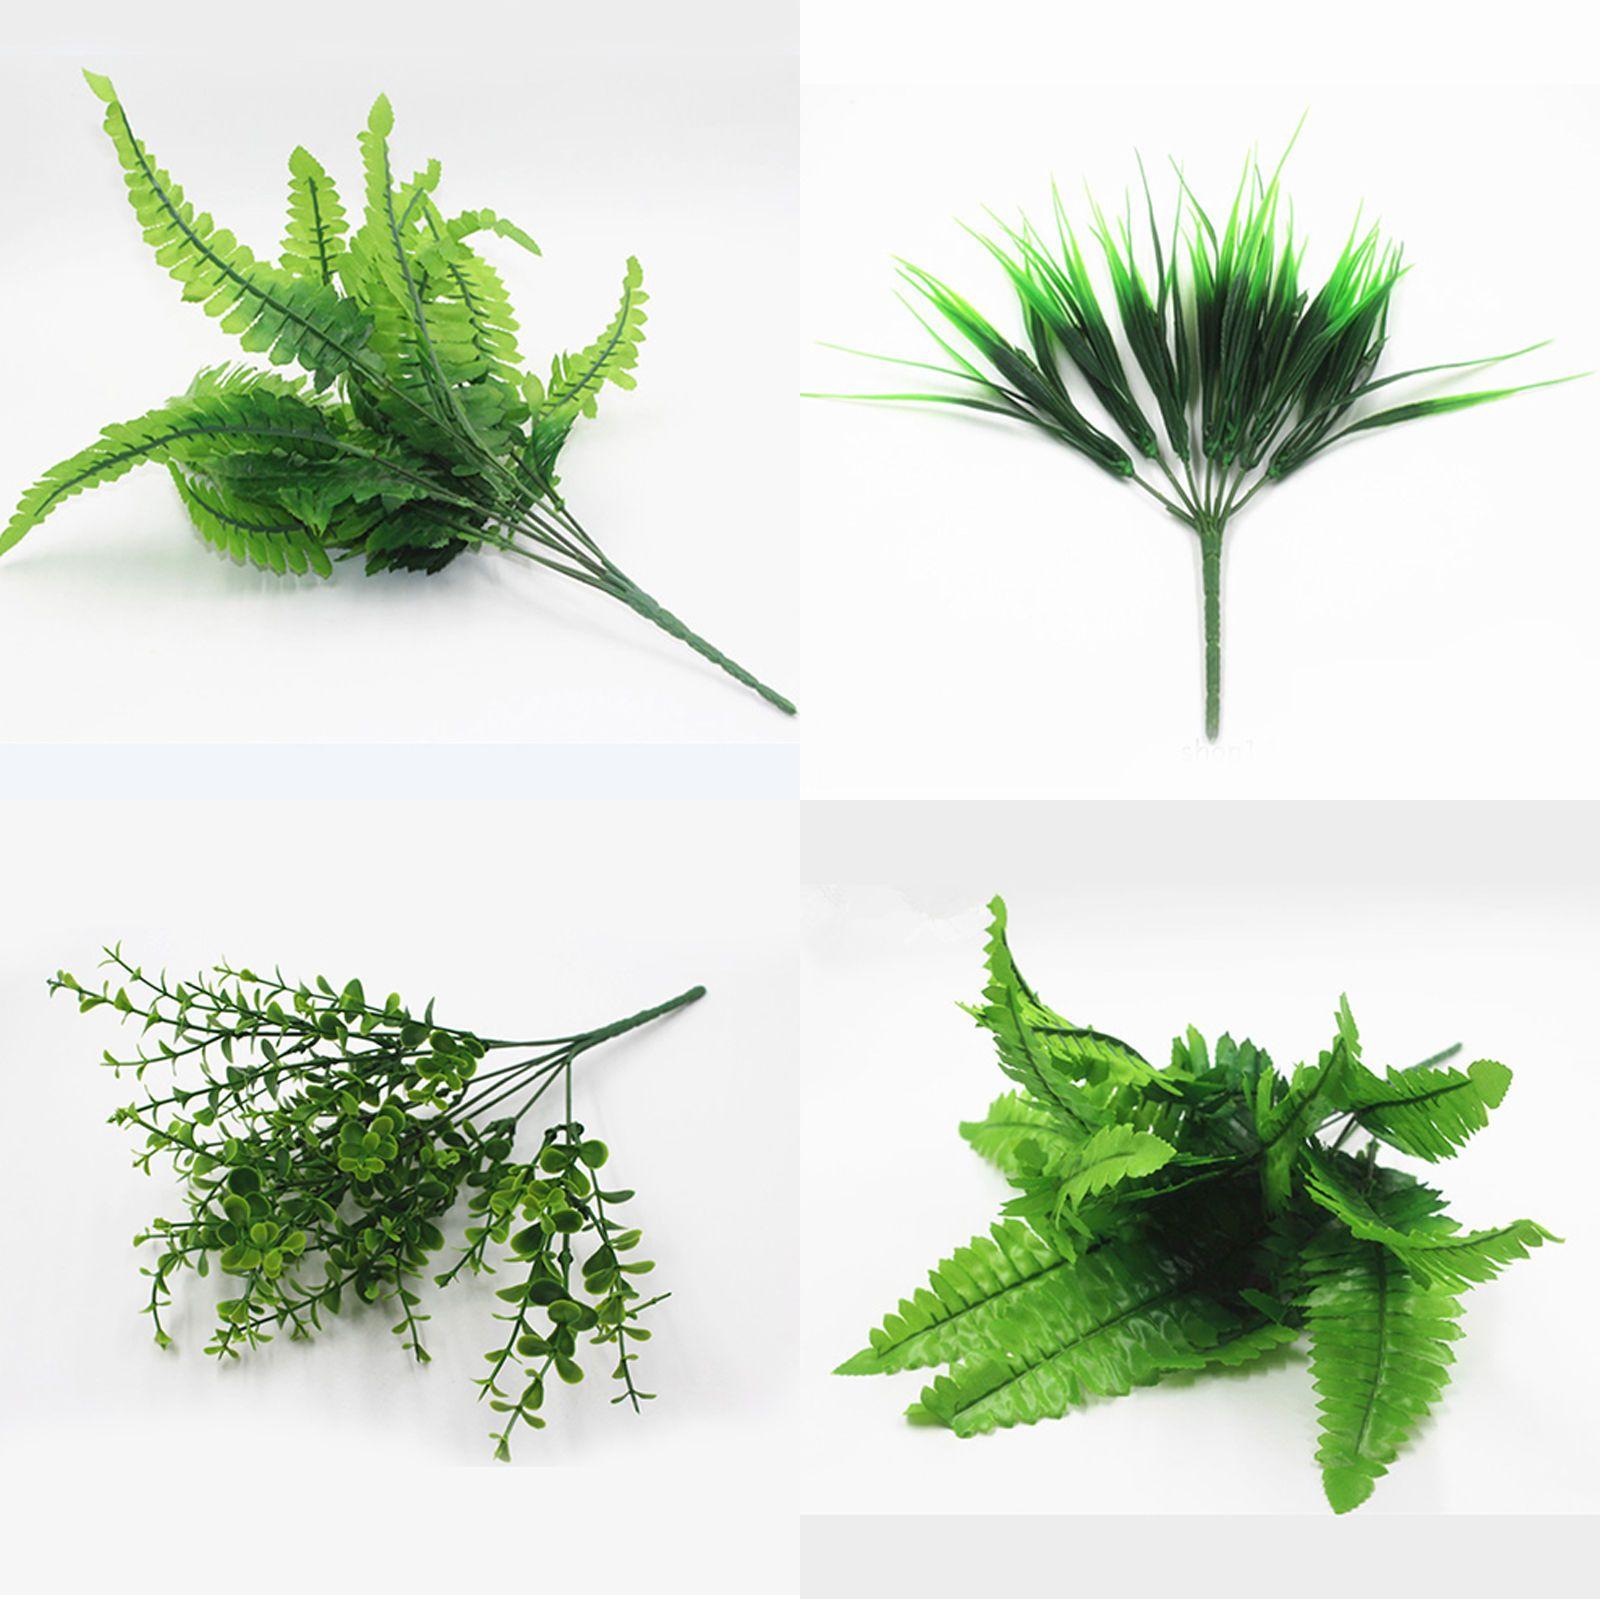 Best Artificial Plants Fake Leaf Foliage Flower Foliage Home Office Garden Decor